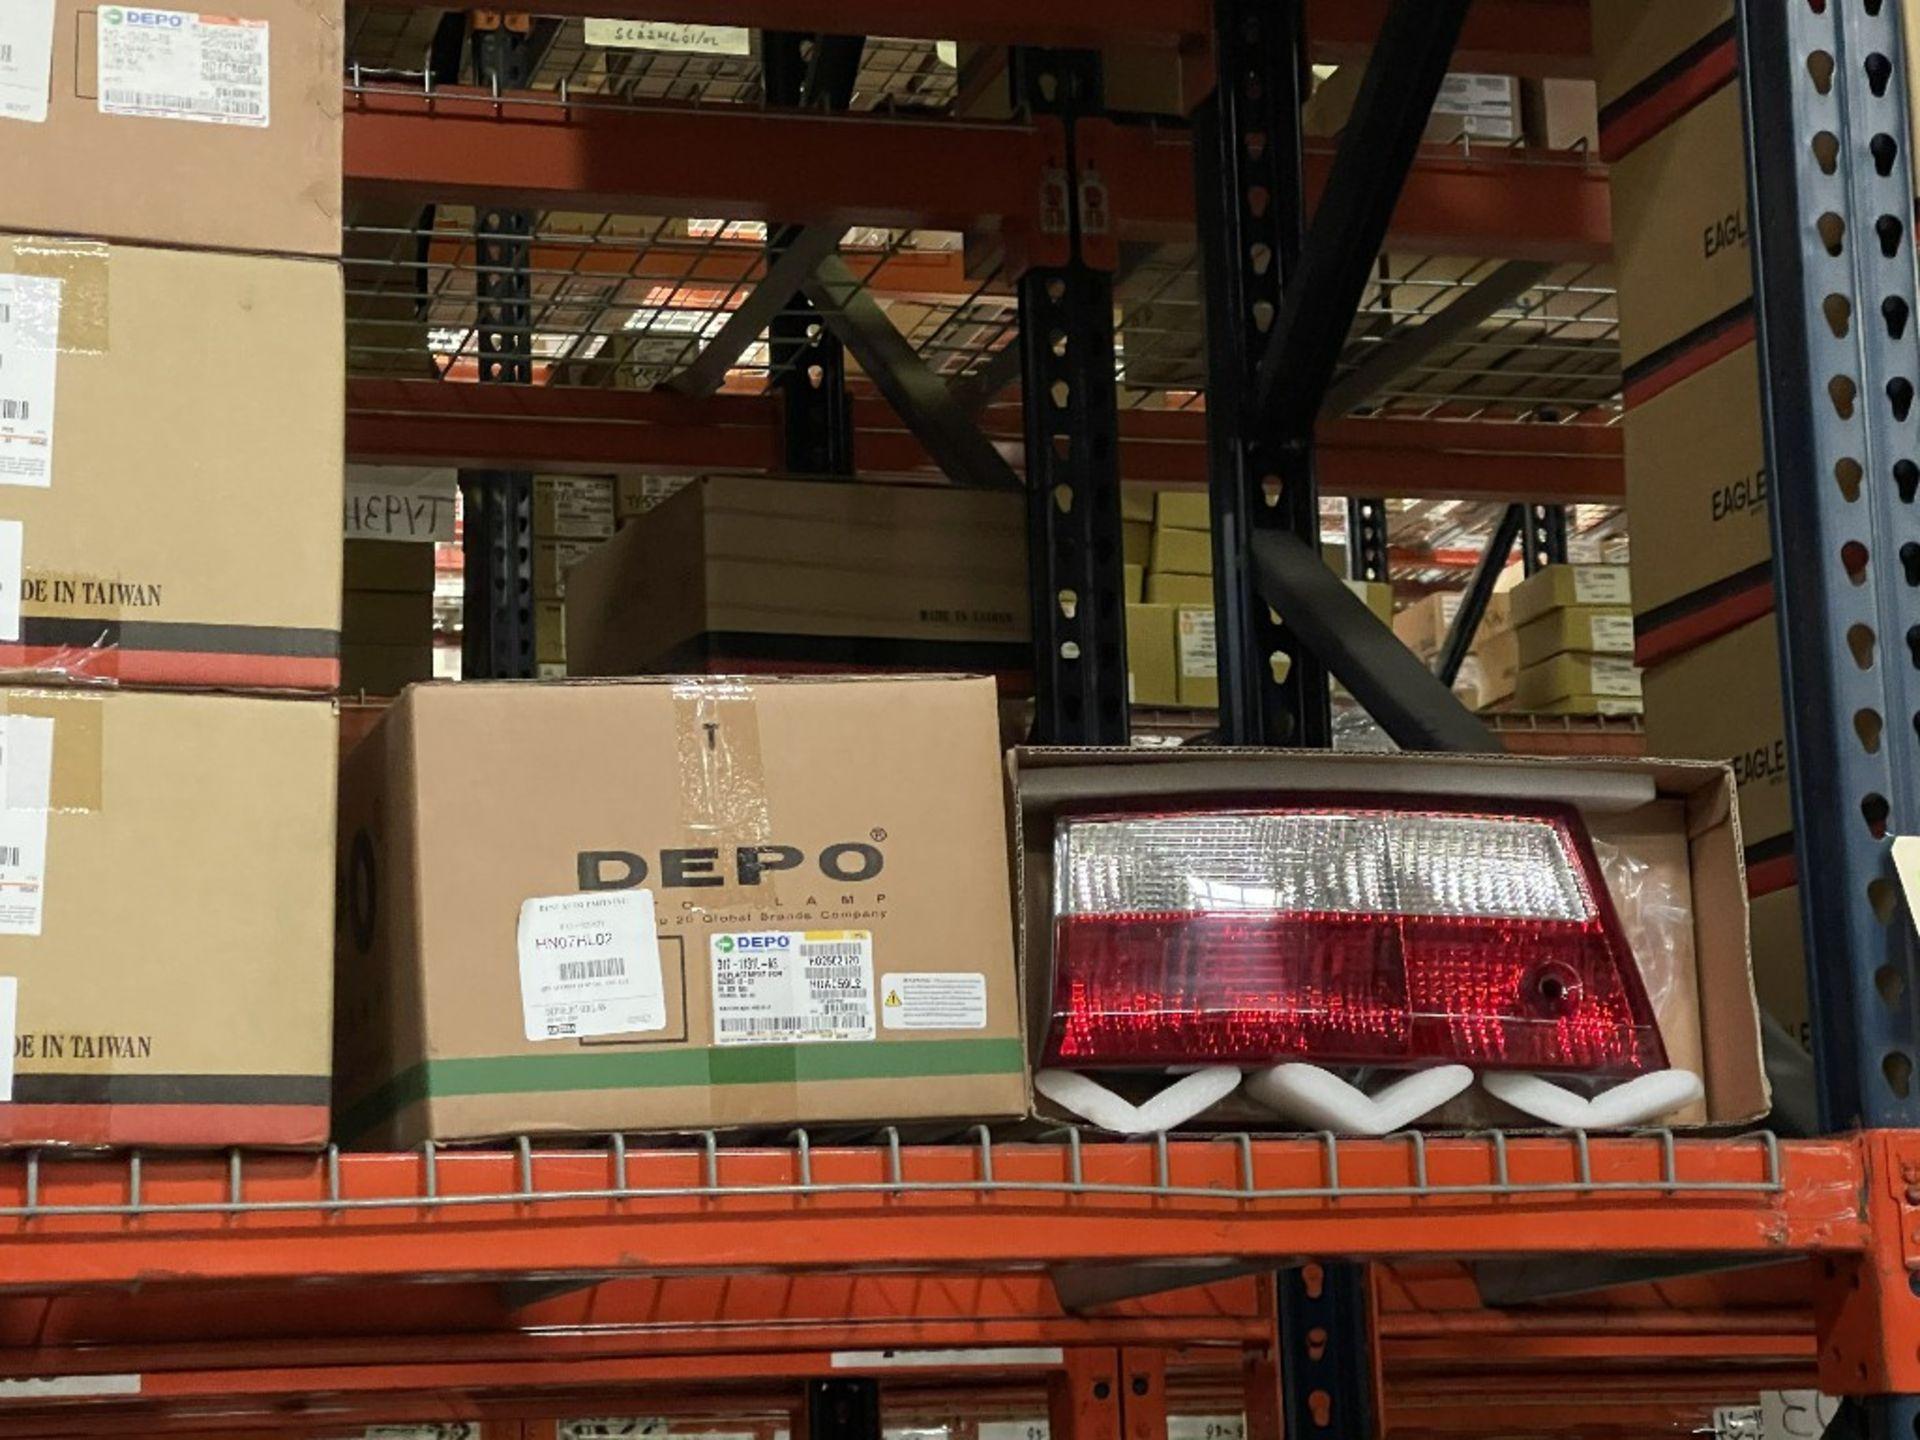 ASST DEPO EAGLE AUTO LAMPS ACCORD CRV 35X - Image 3 of 3